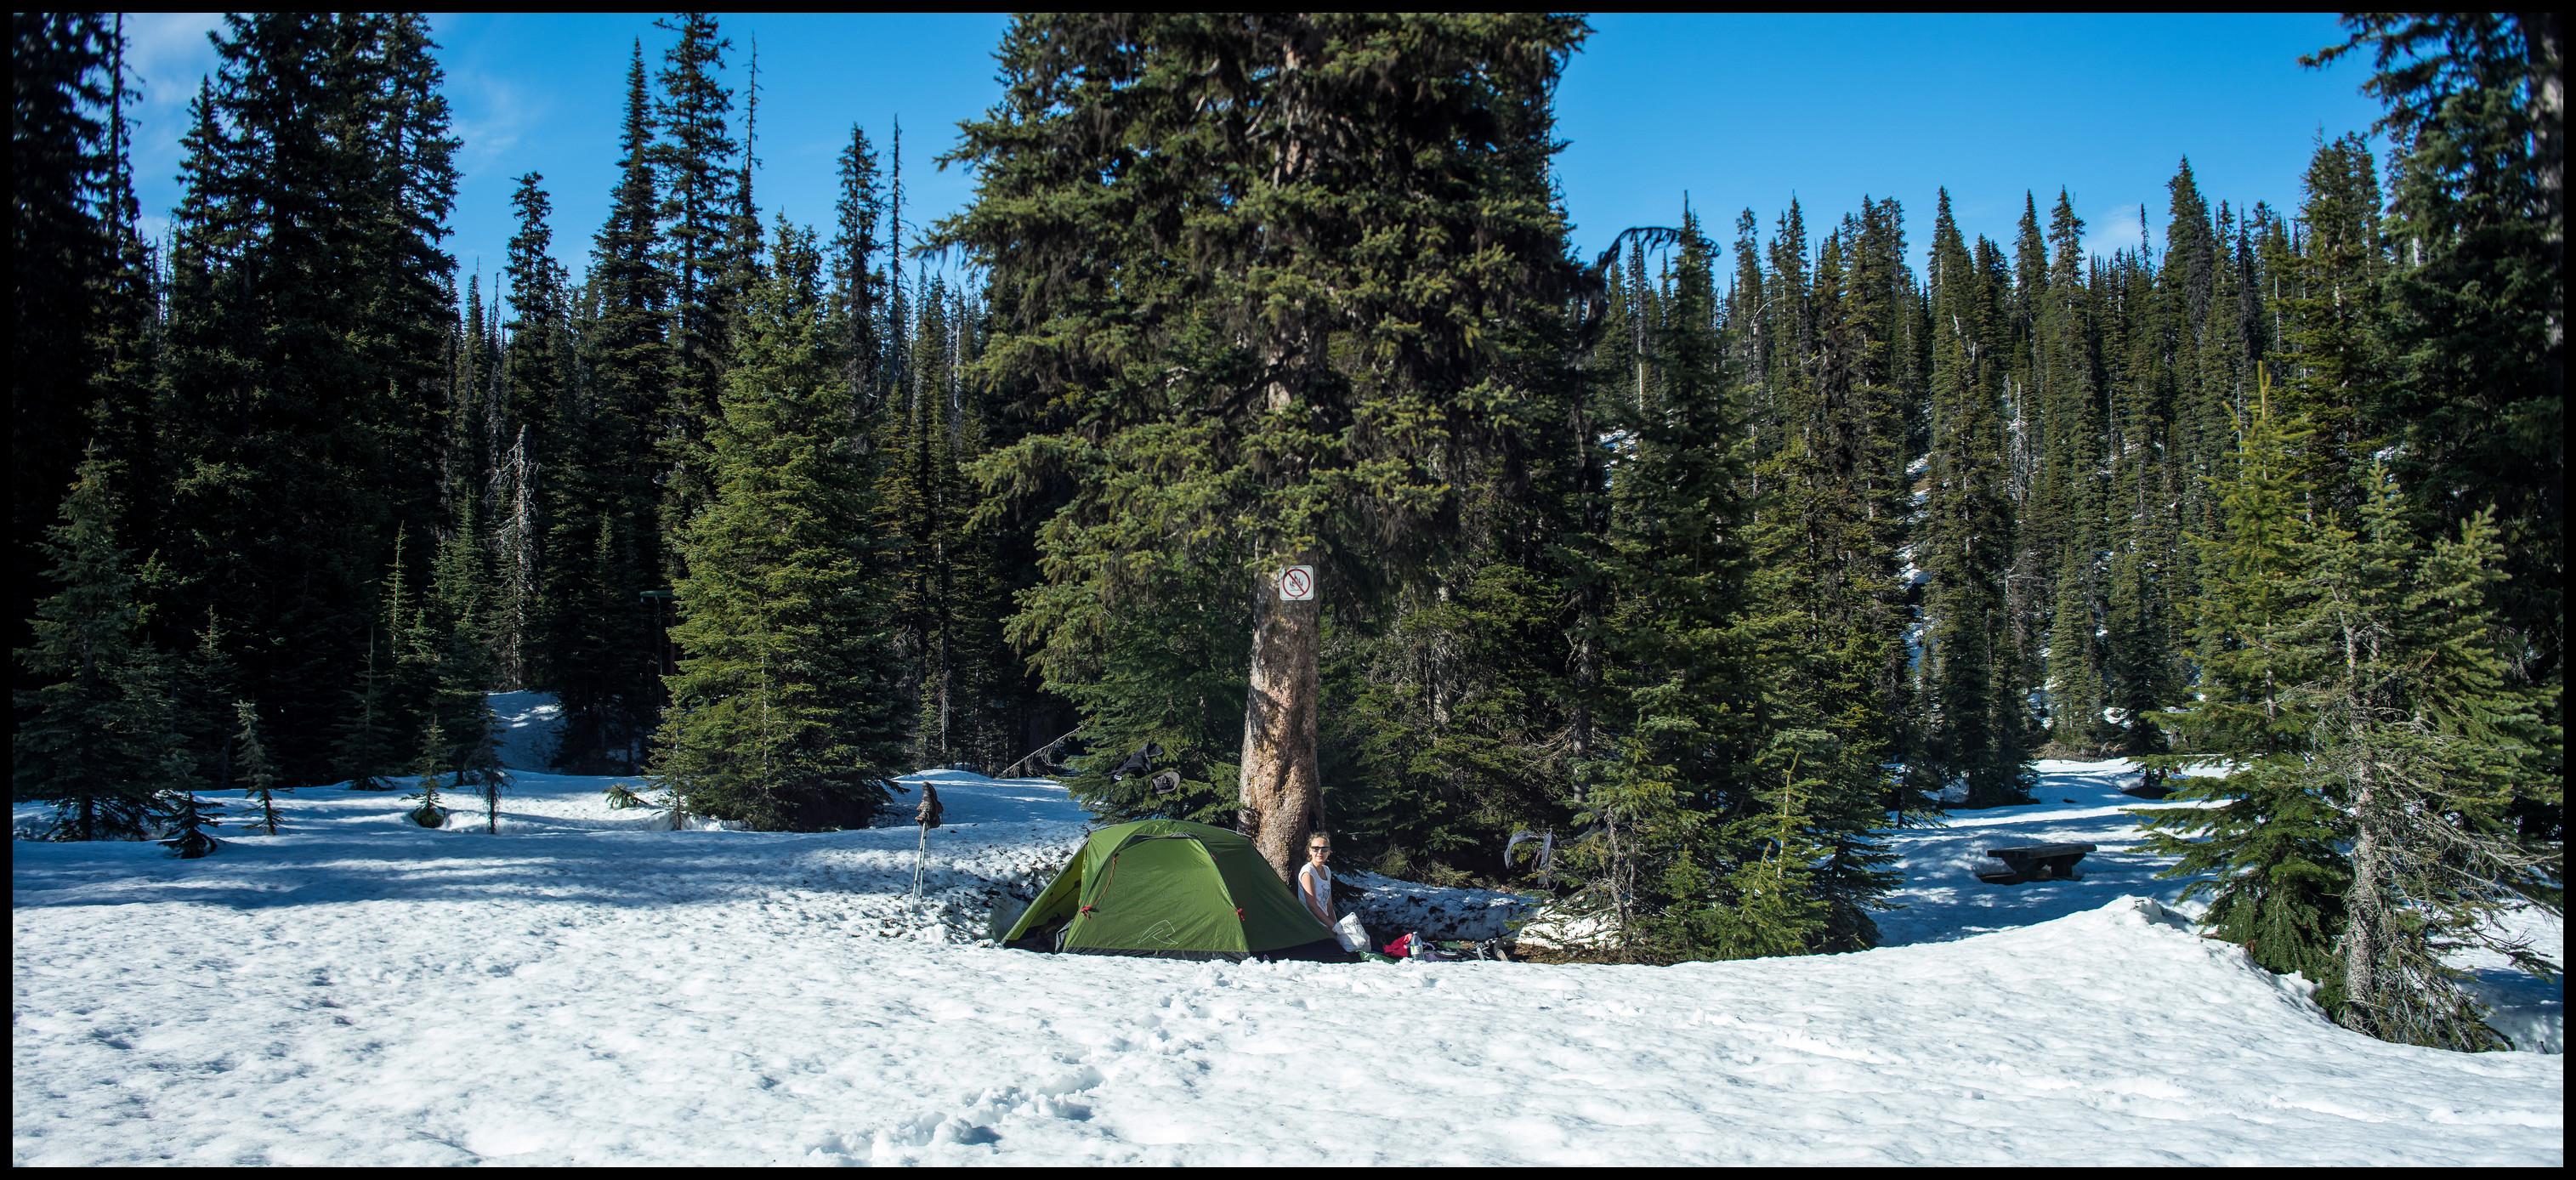 Yoho Lake Winter Camping Sony A7 / Canon FD Tilt Shift 35 2.8